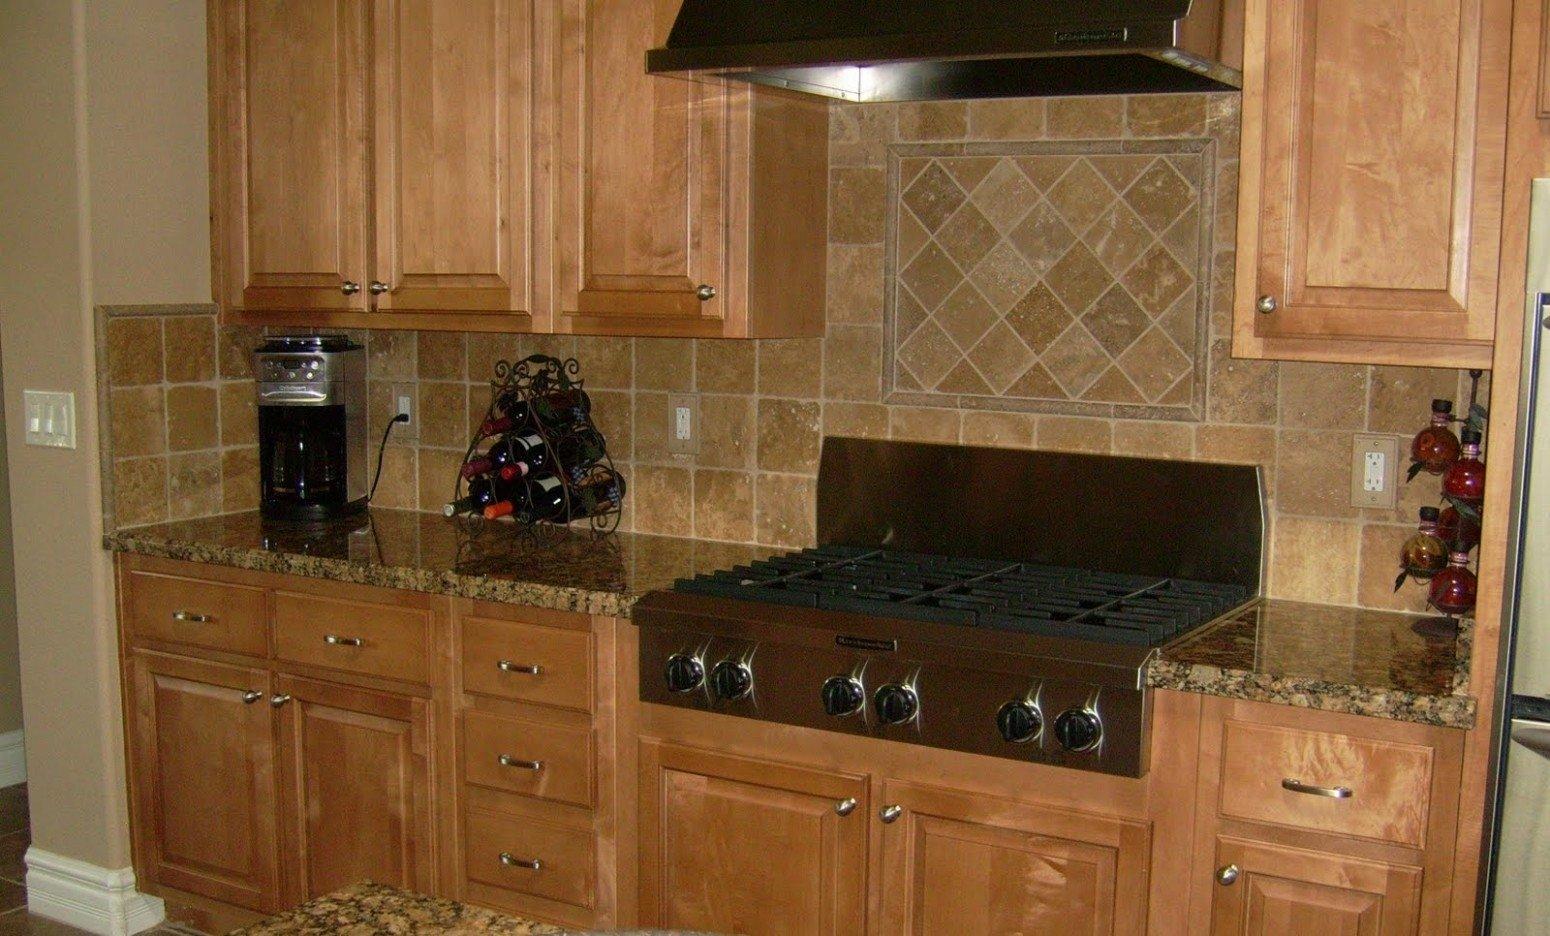 10 Gorgeous Ideas For Kitchen Backsplash With Granite Countertops backsplash ideas for granite countertops kitchen saomcco avaz 2020